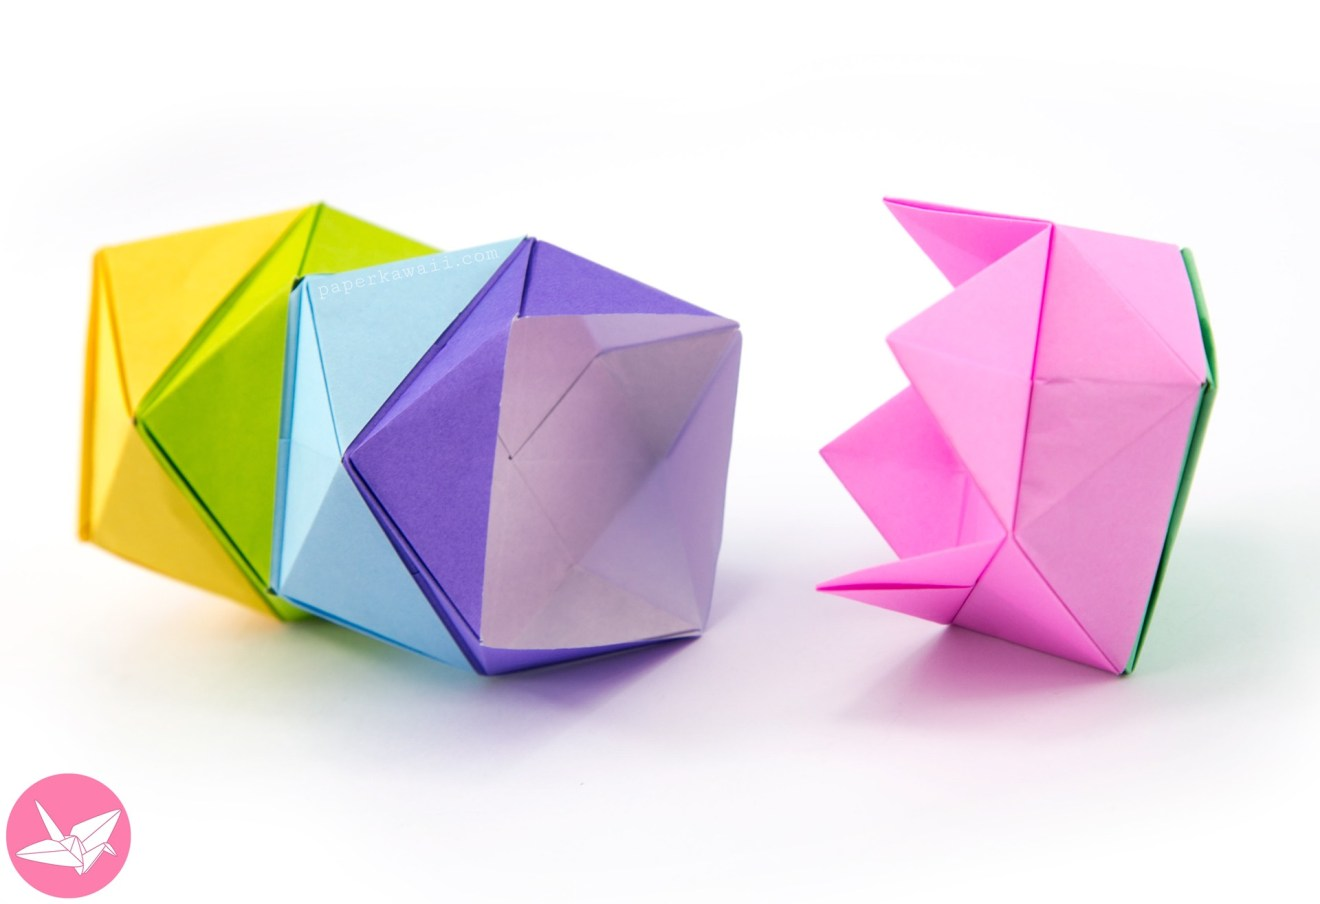 Origami Stacking Boxes Tutorial - Interlocking Box via @paper_kawaii